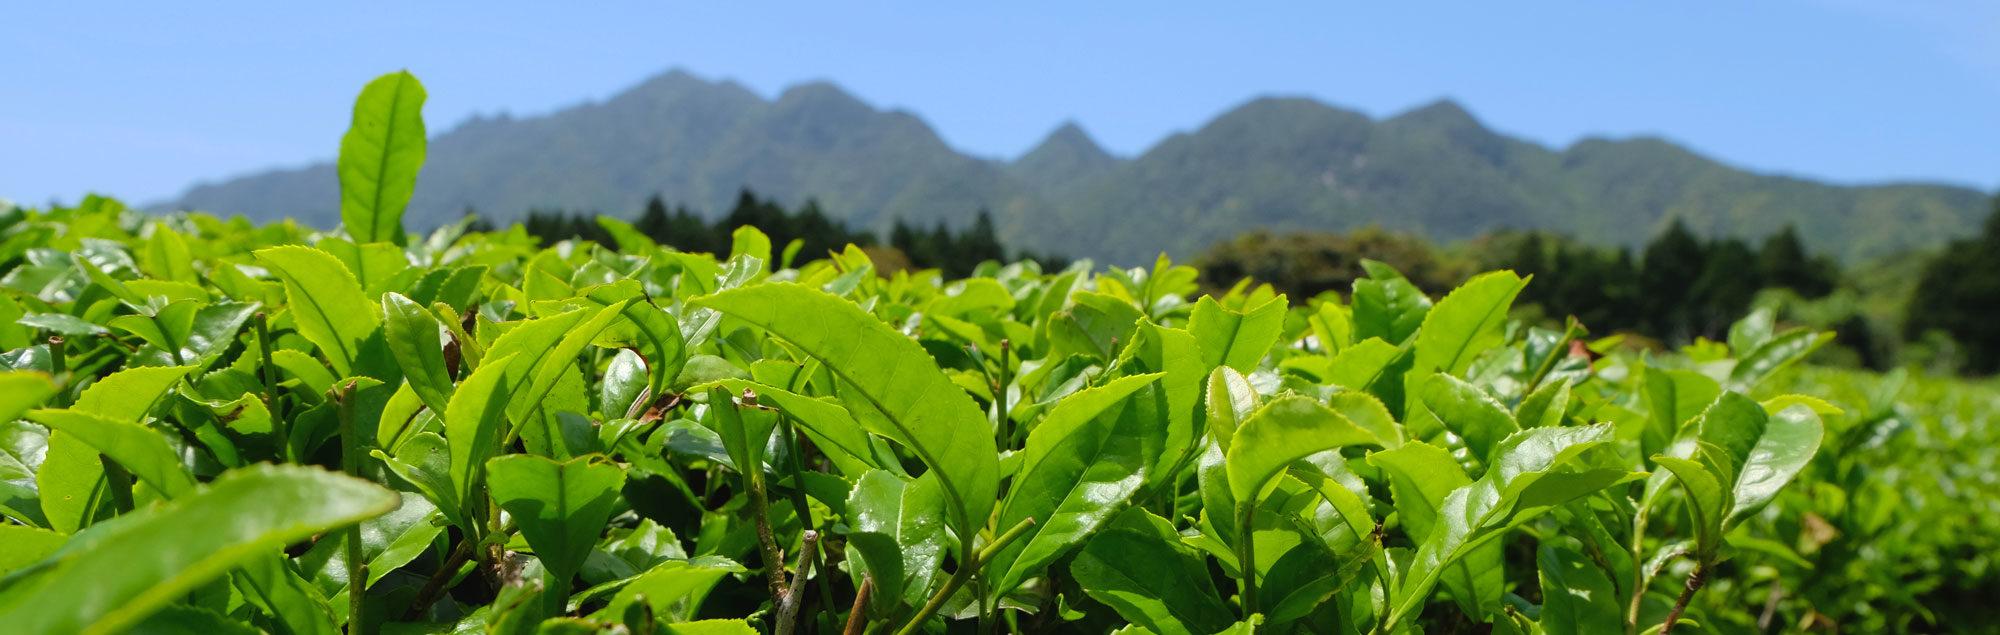 Teefelder Ernte Bancha